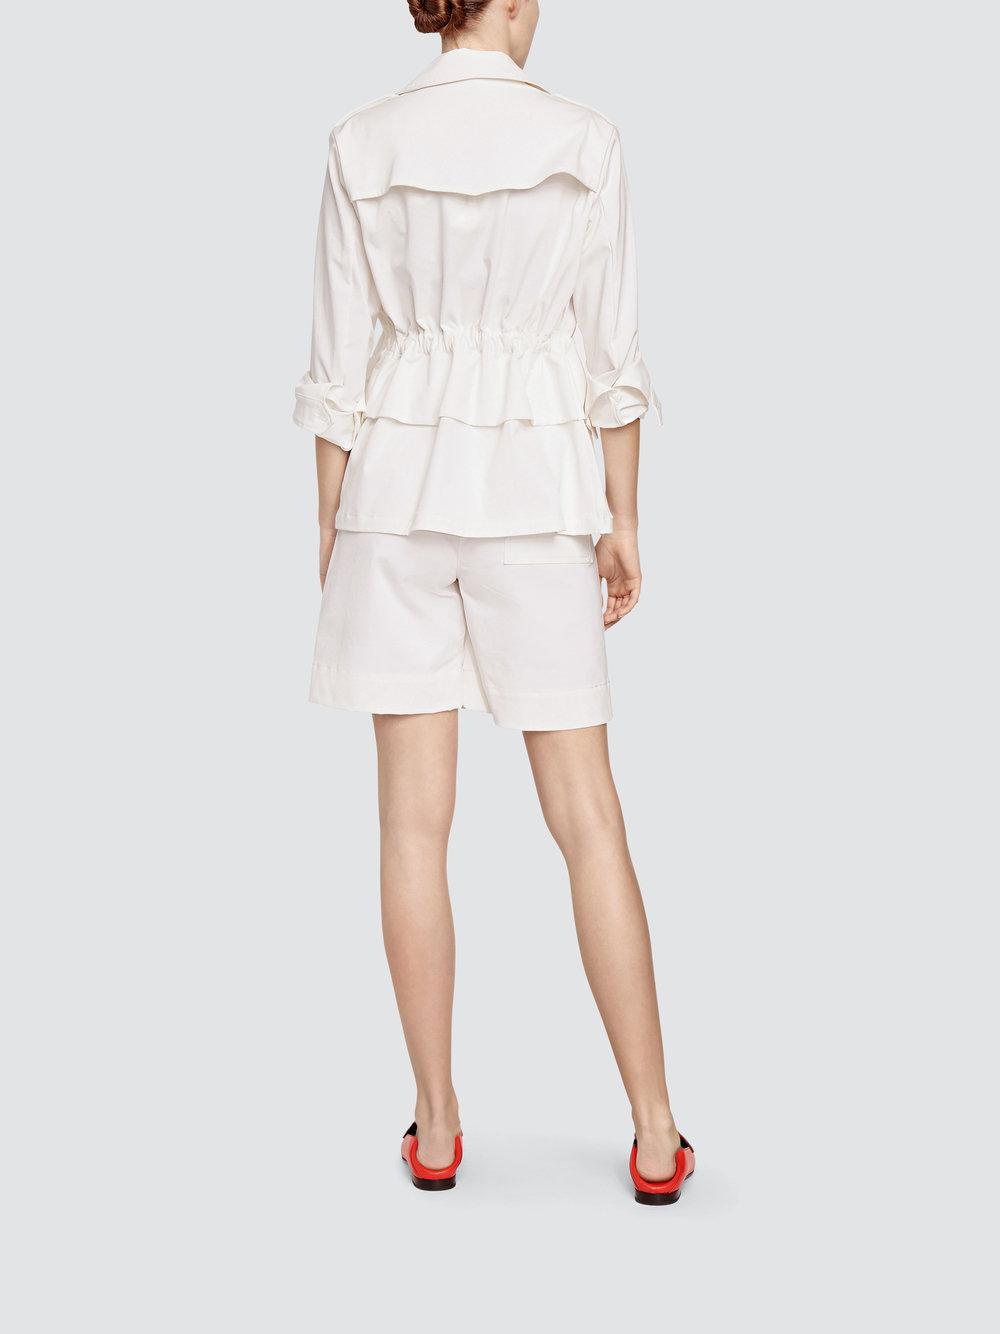 peach cotton short - White Tomas Maier oHKOM71ltv